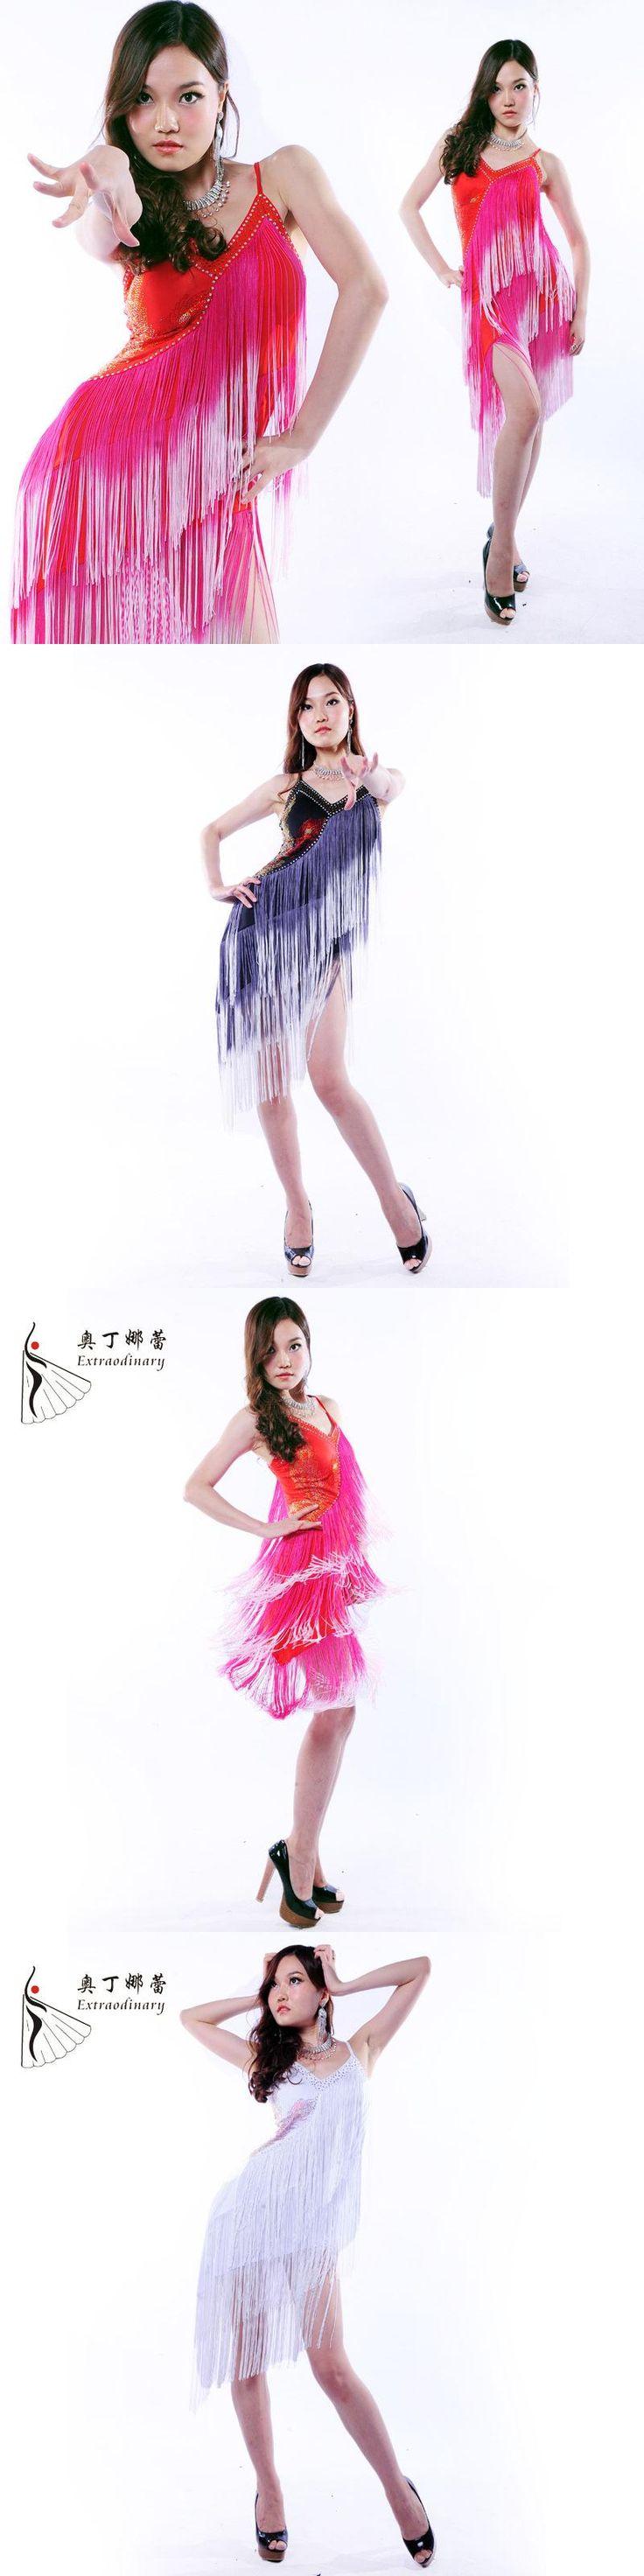 Latin Dance Dress Professional Latin Outfit Samba Dance Latin Salsa Dresses Women Dance Costumes Clothes for Dancing #L00711